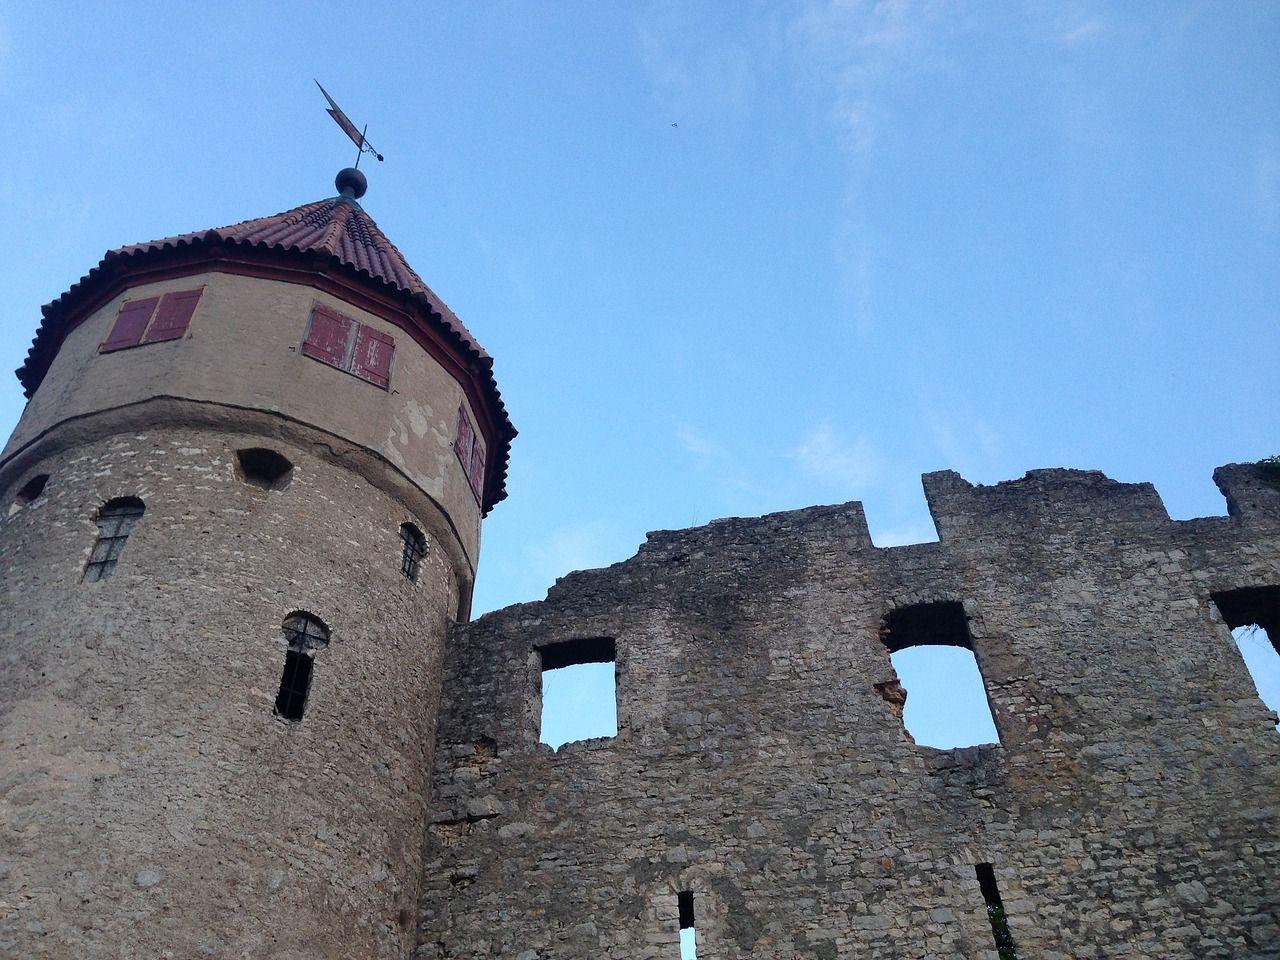 Germany, Castle, Honing Mountain, Tuttlingen #germany